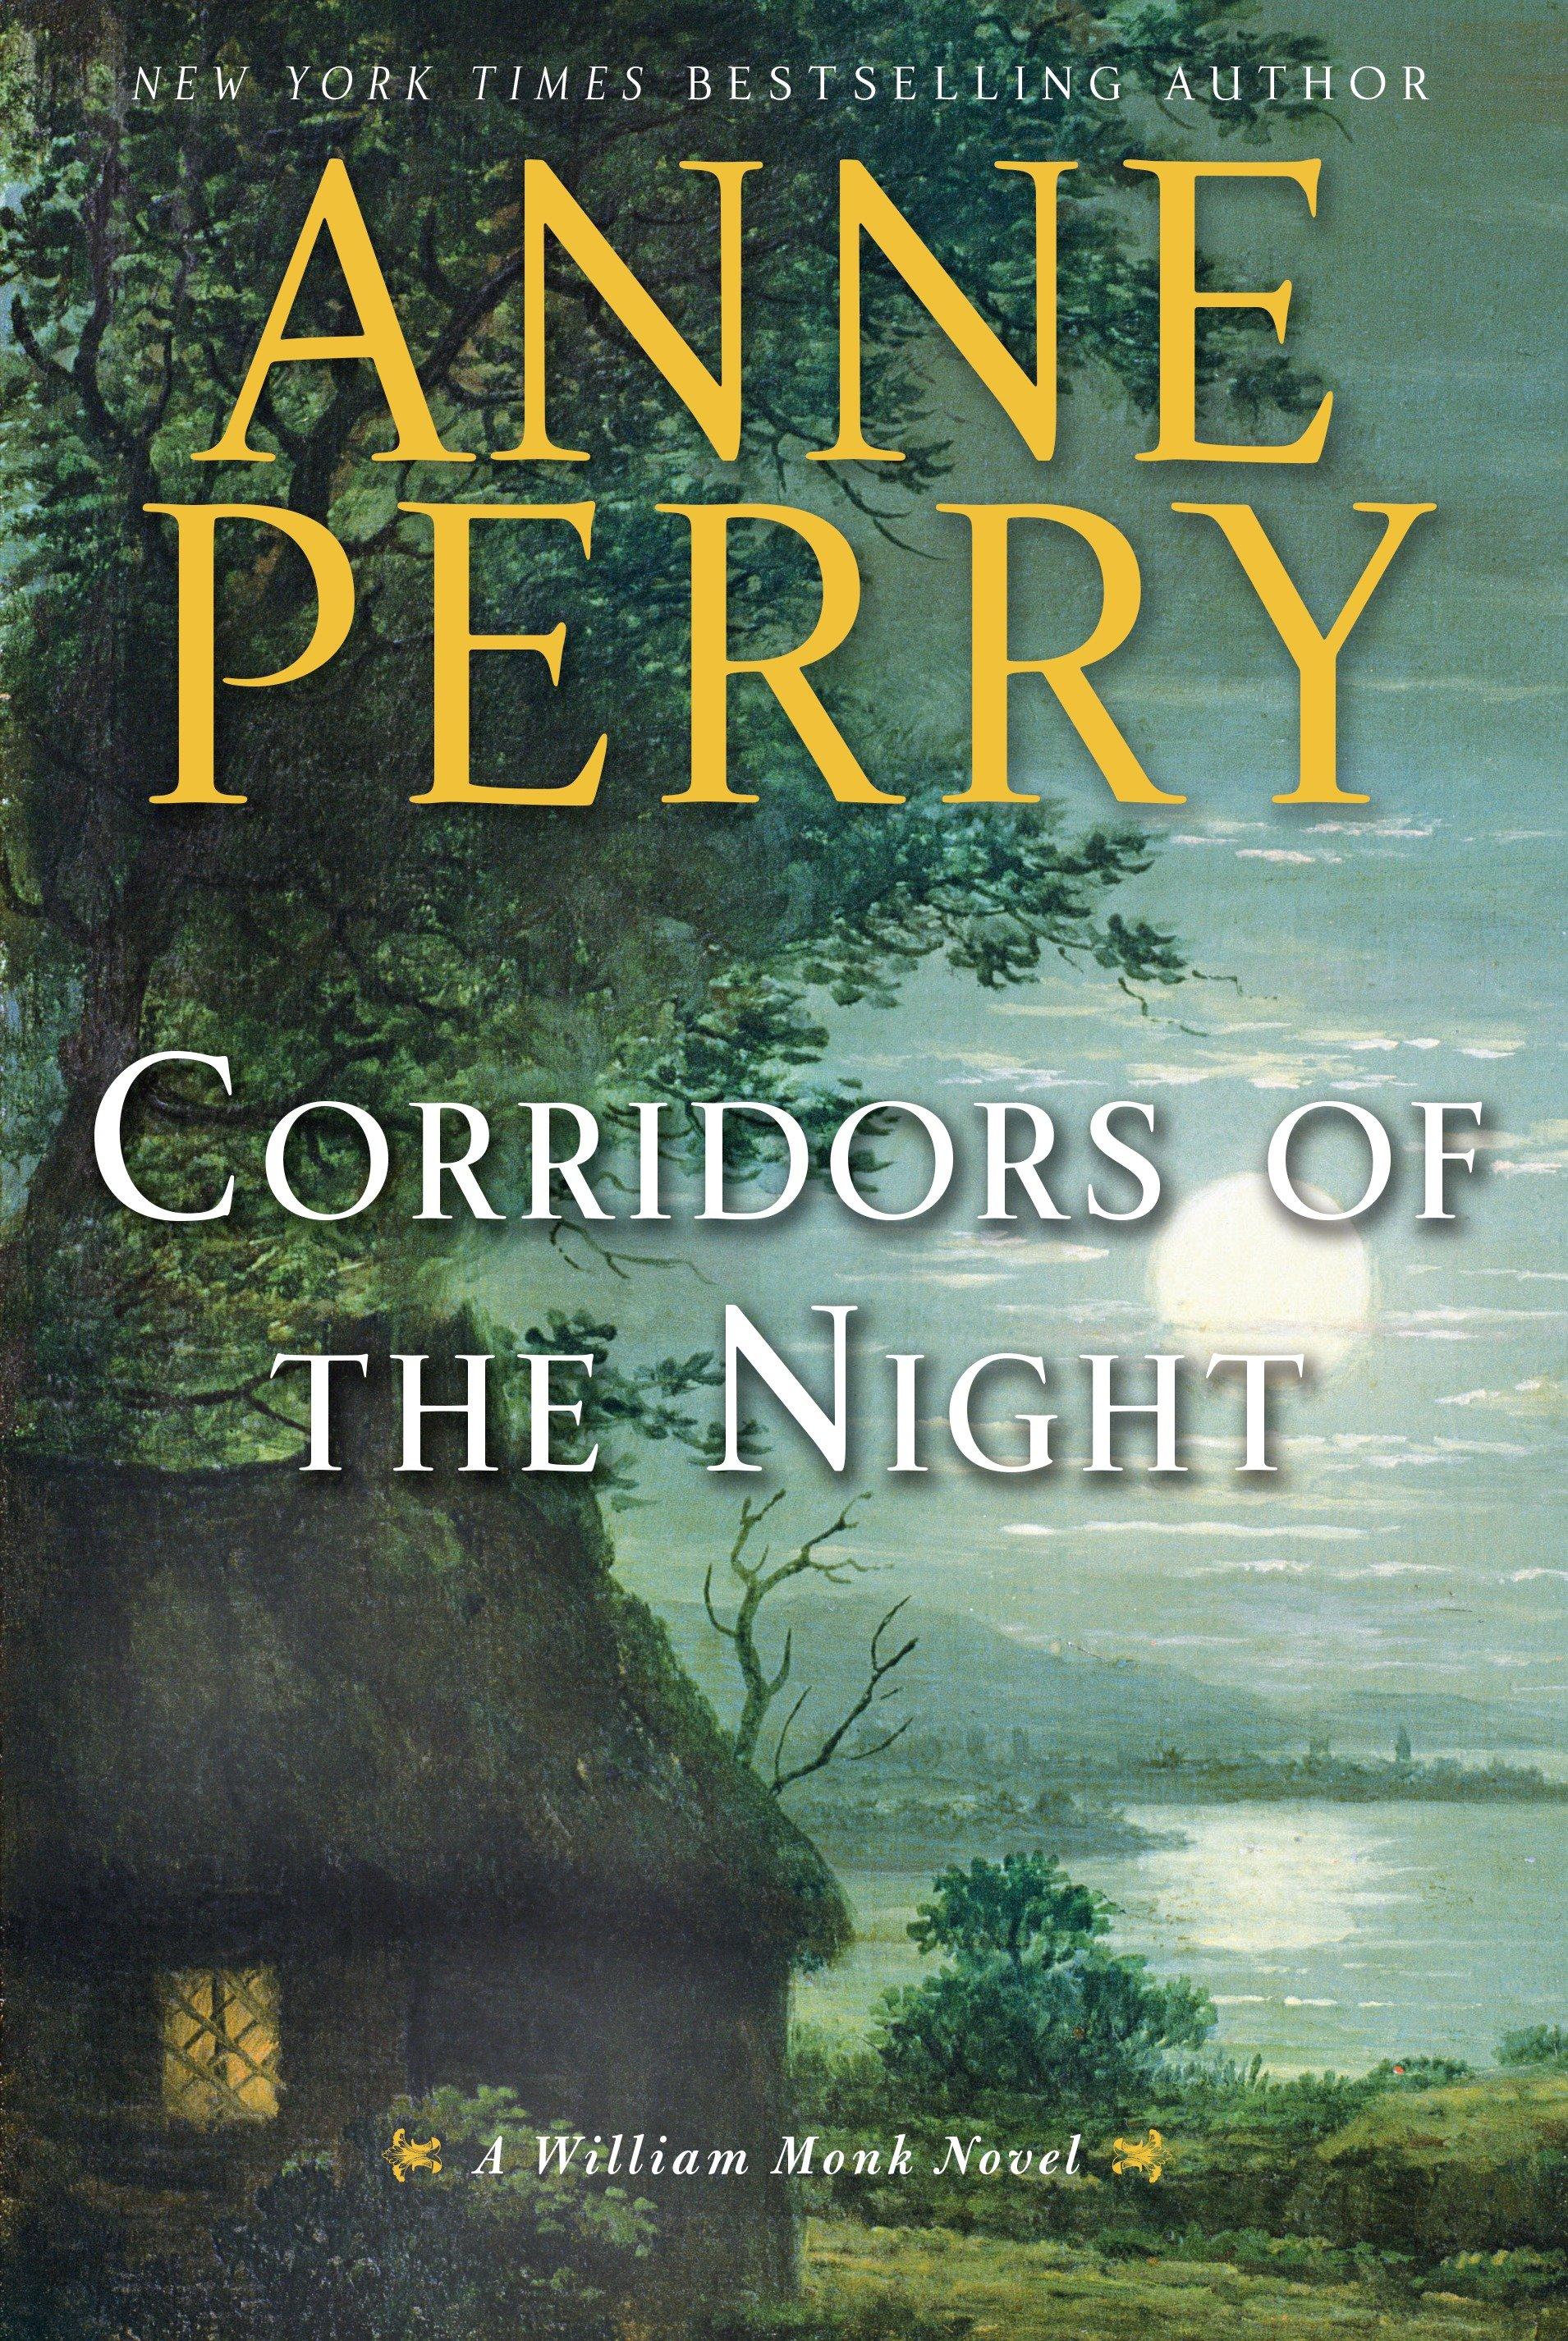 Corridors of the night : a William Monk novel